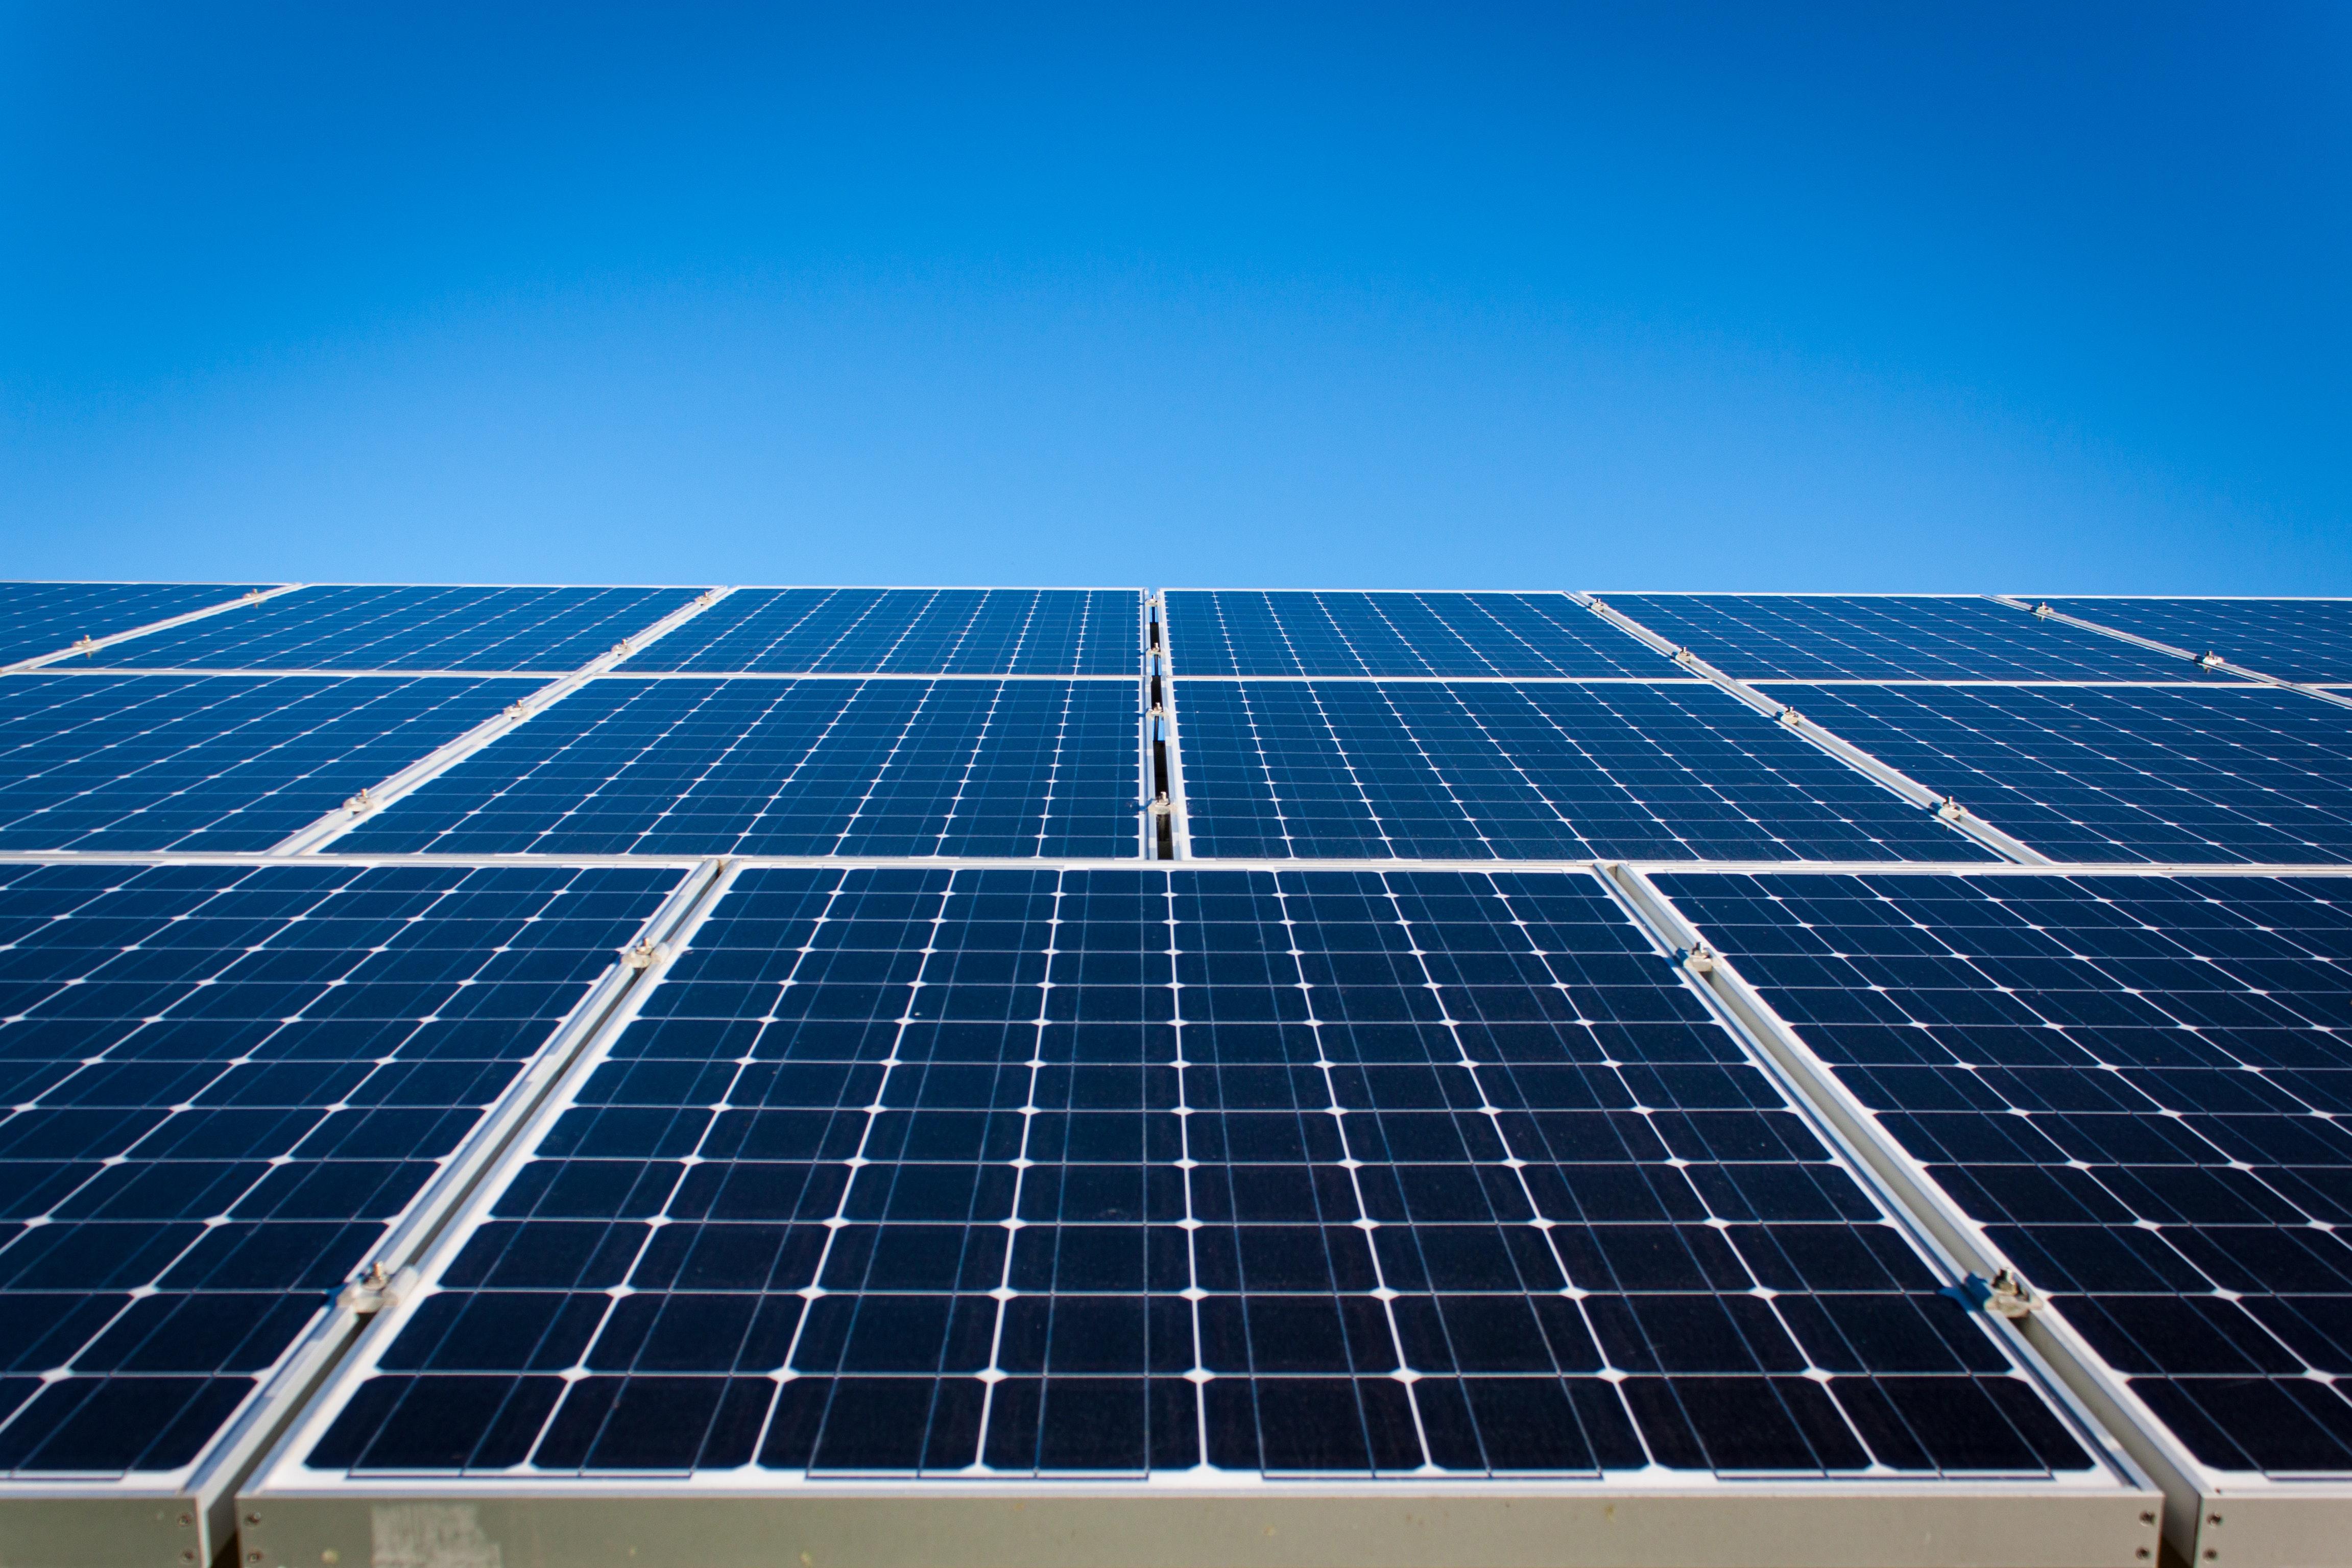 home improvements solar panels environmental green energy saving blog